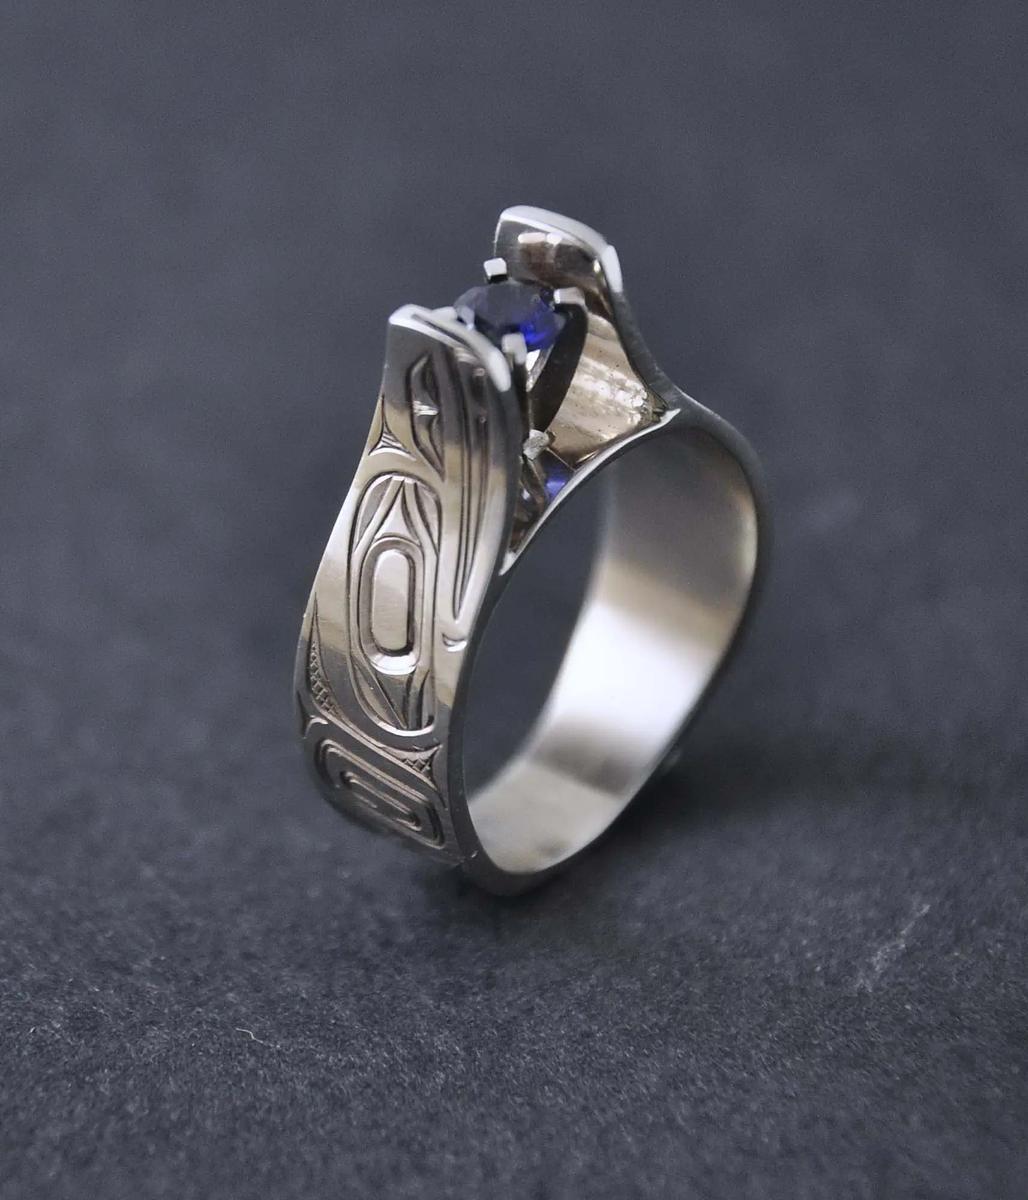 Raven White Gold & Sapphire Ring